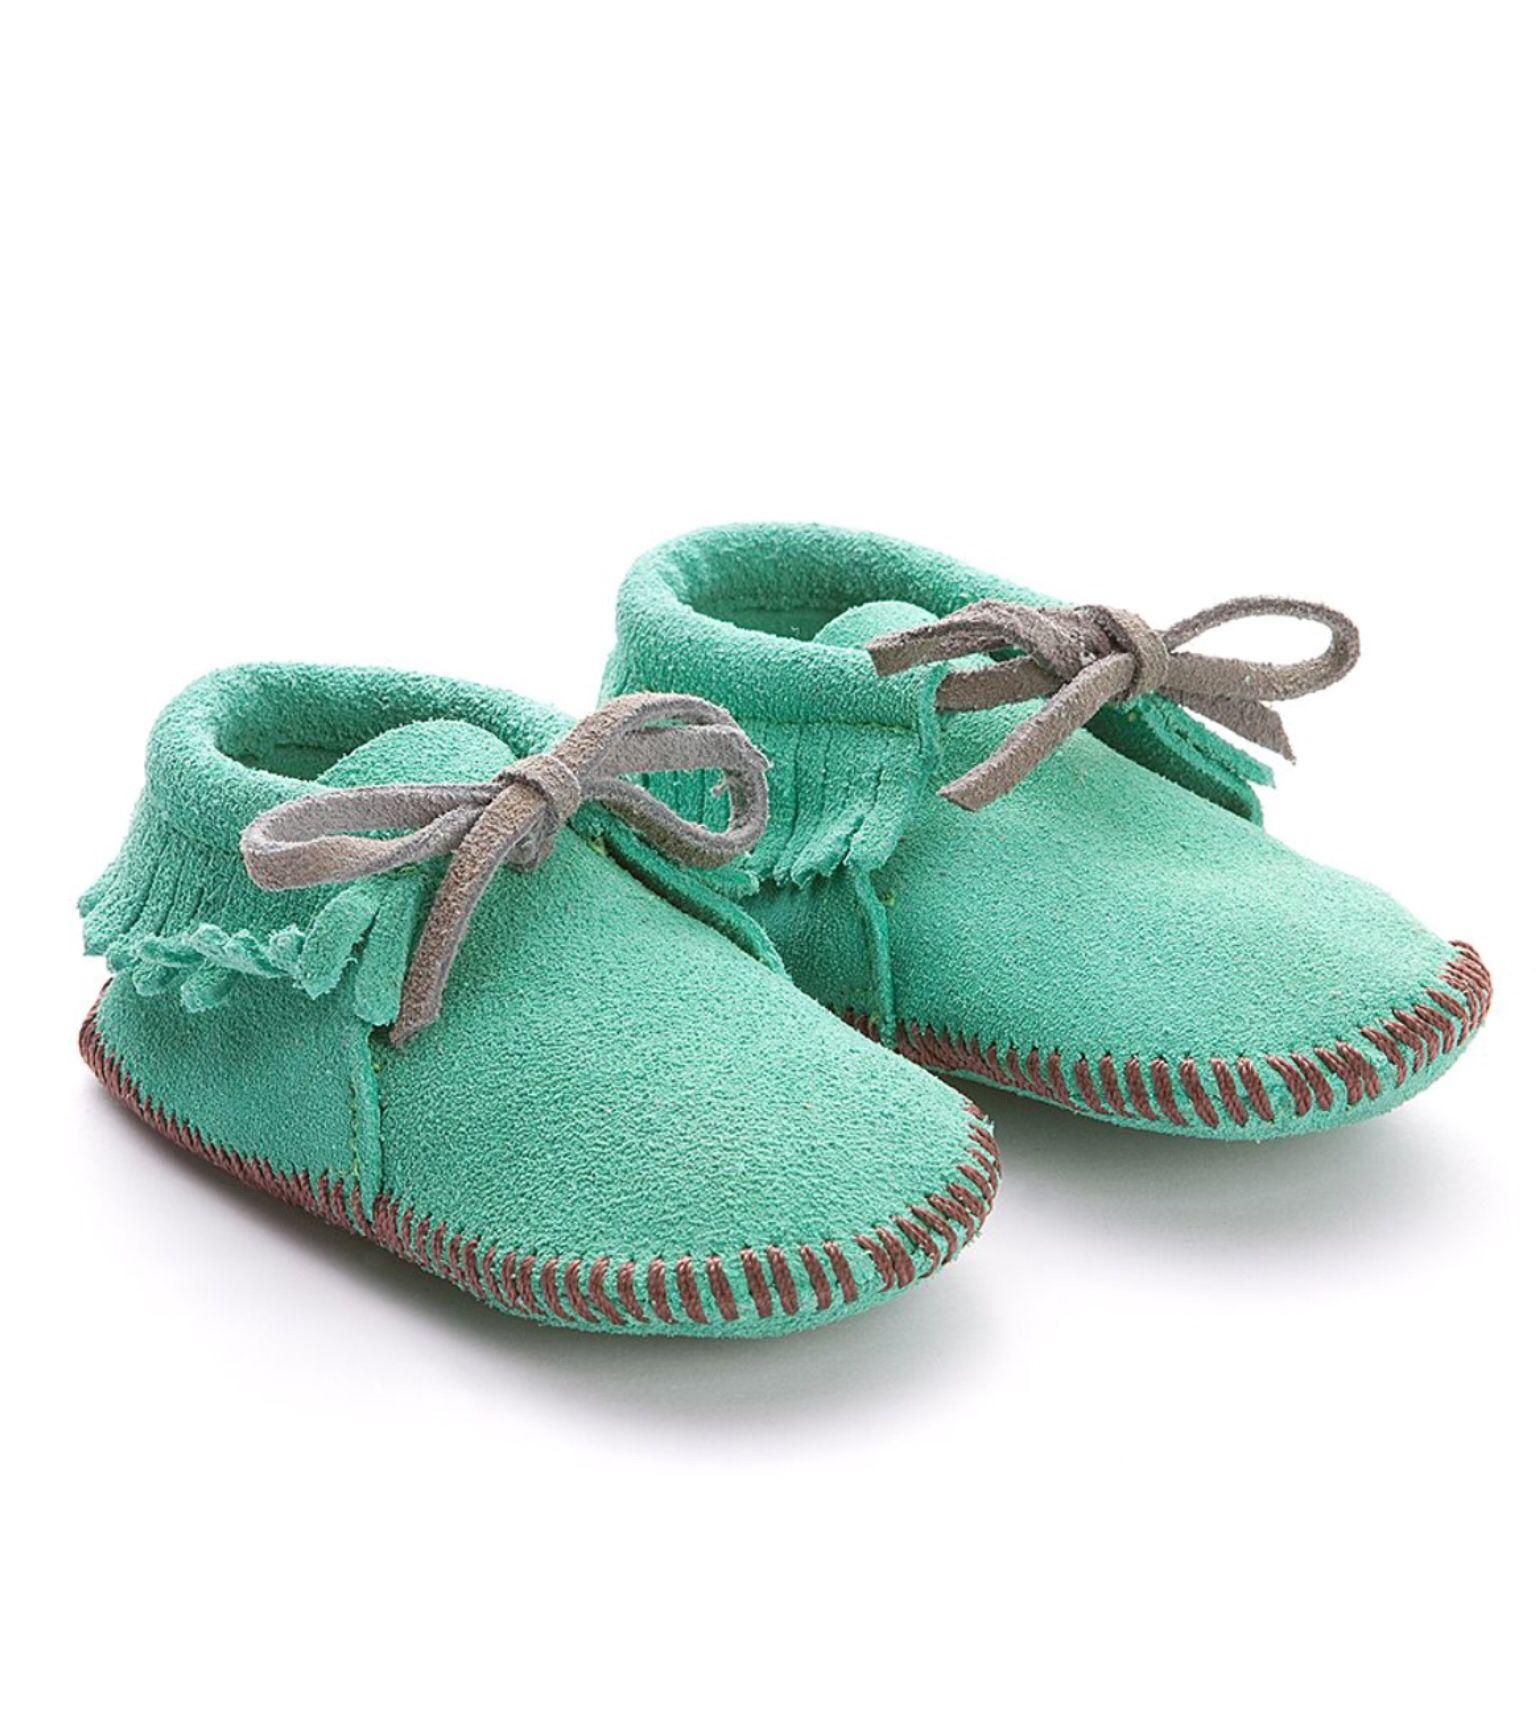 Pin De Beata Zajdel Em Little Darling Moda Infantil Sapatos Moda